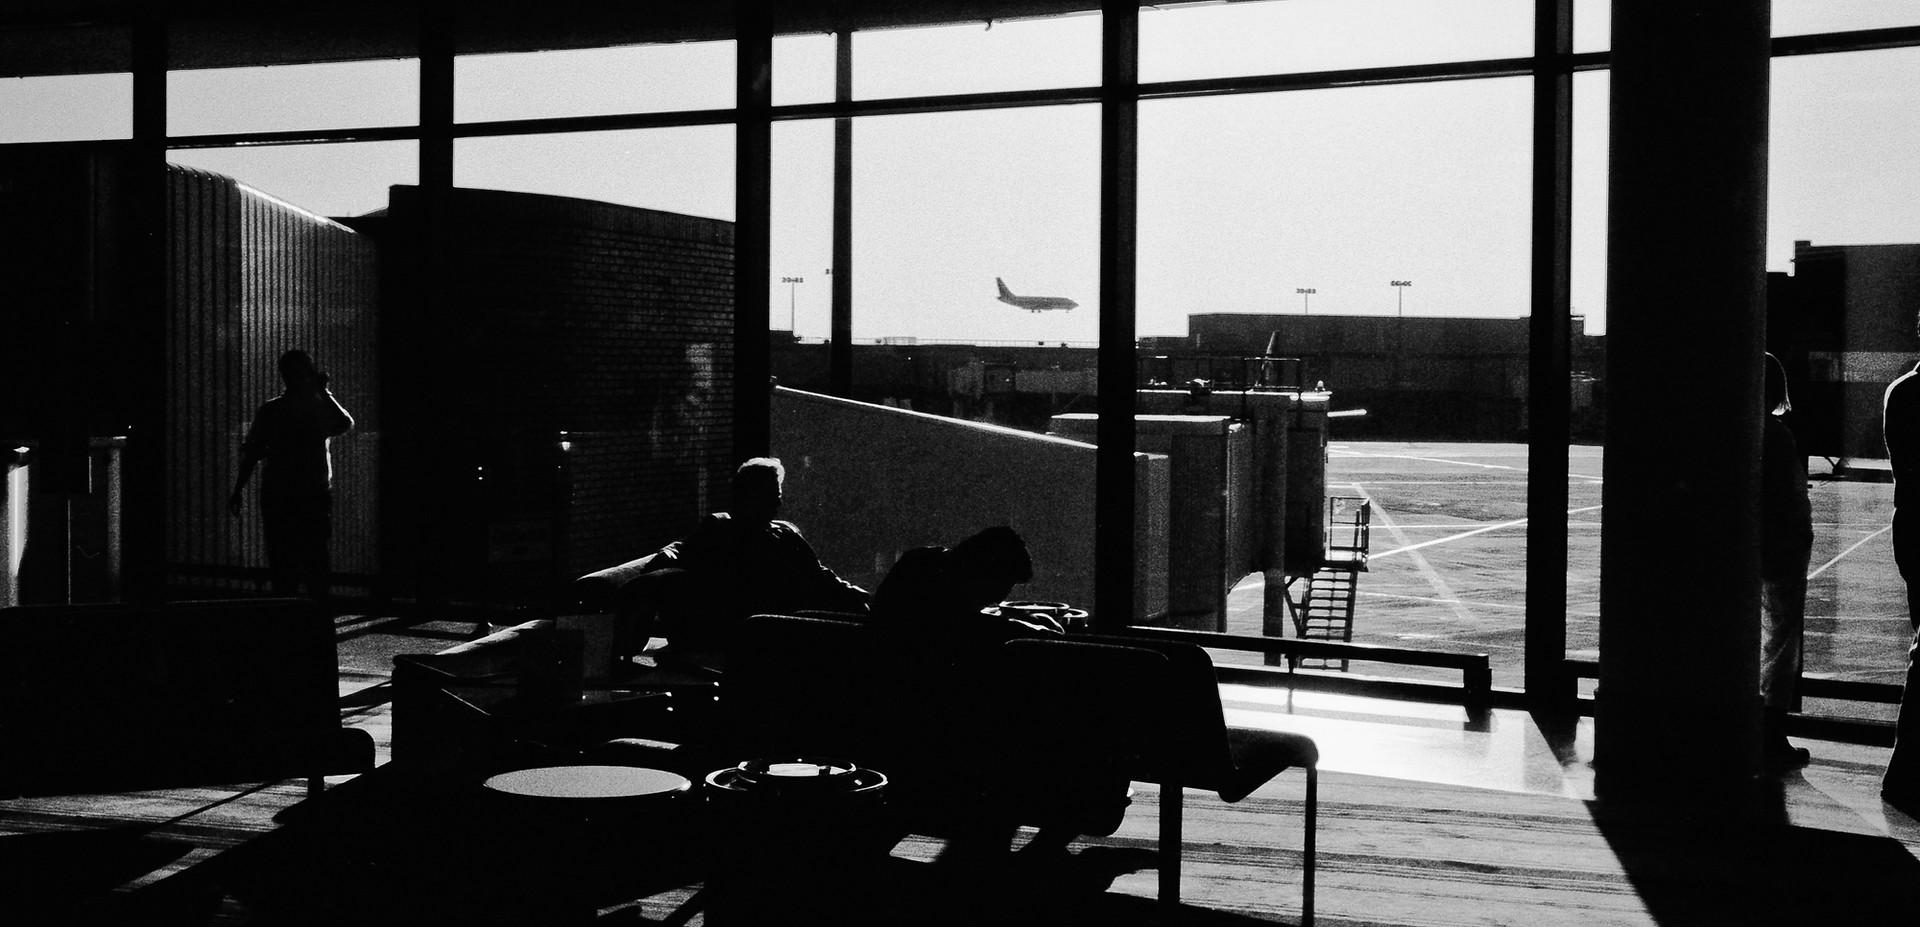 Gatwick Airport, England 1981